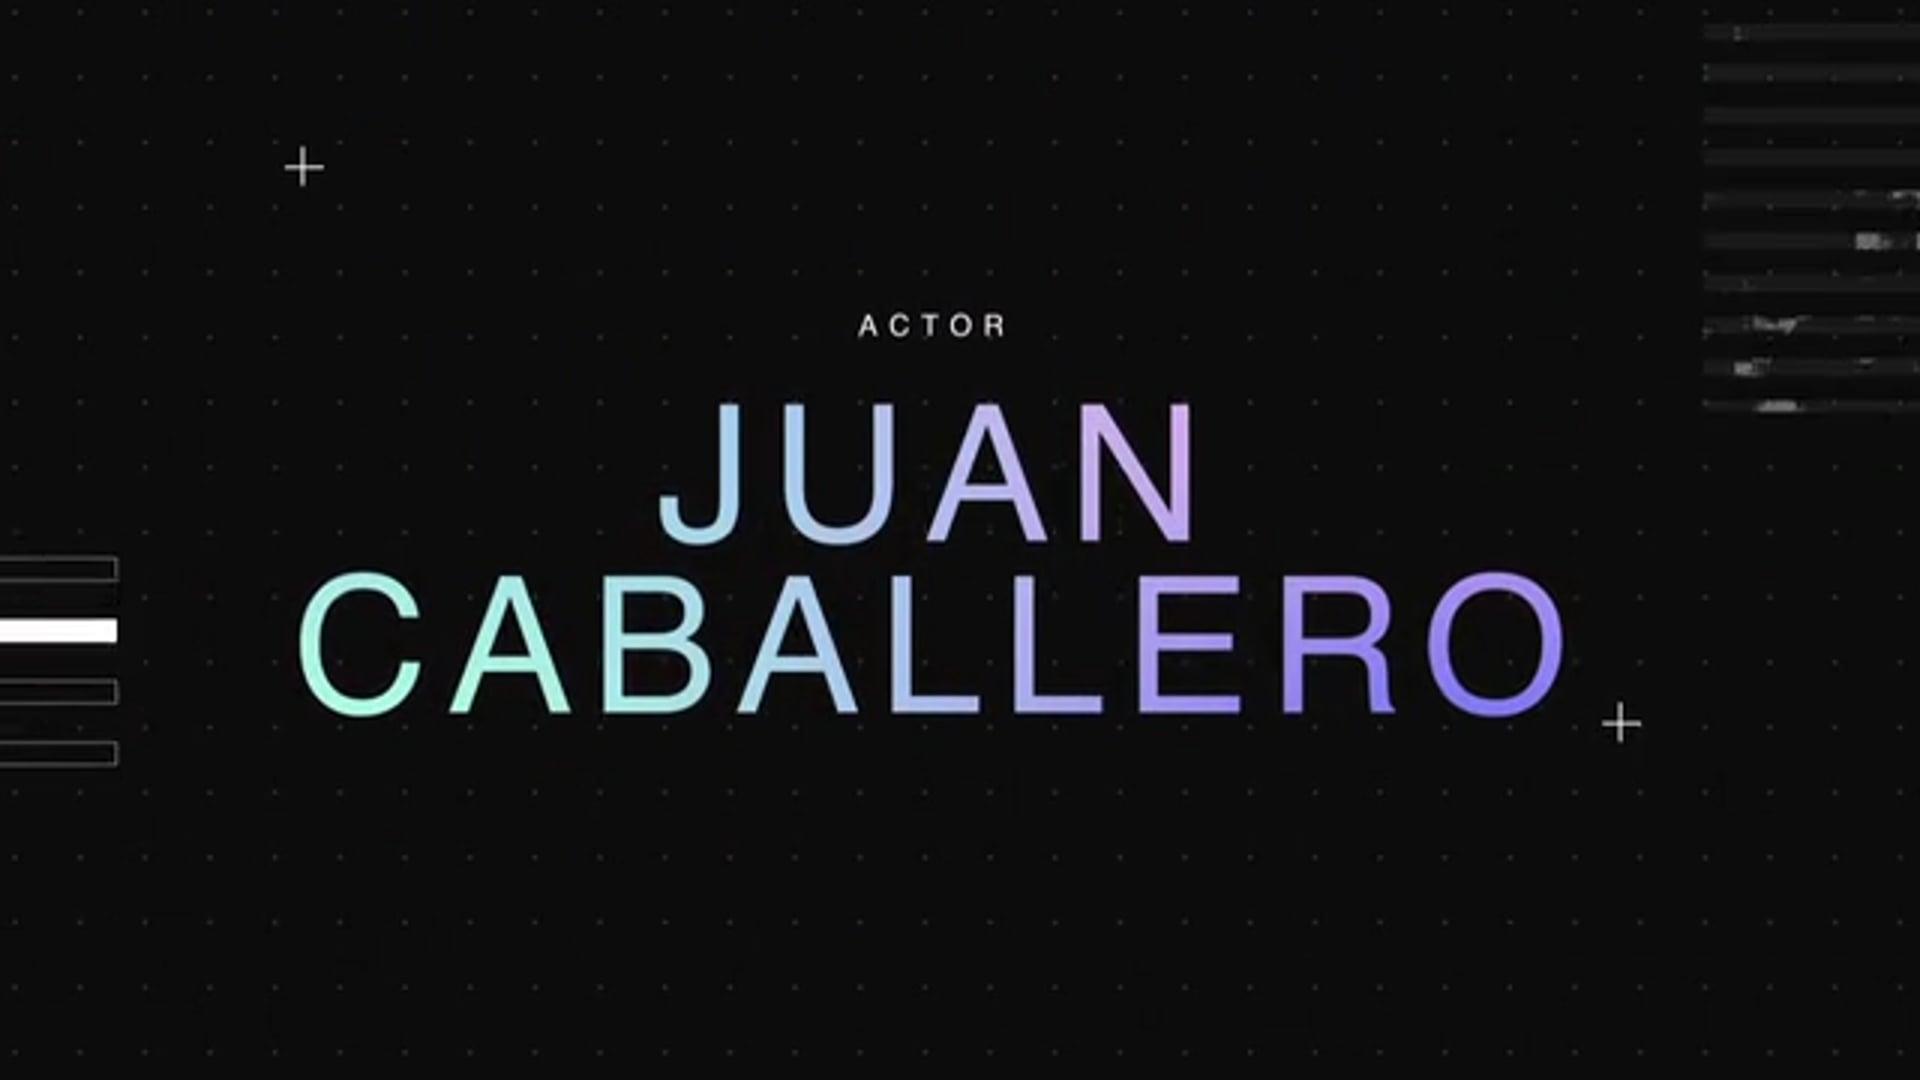 Juan caballero Videobook 2021